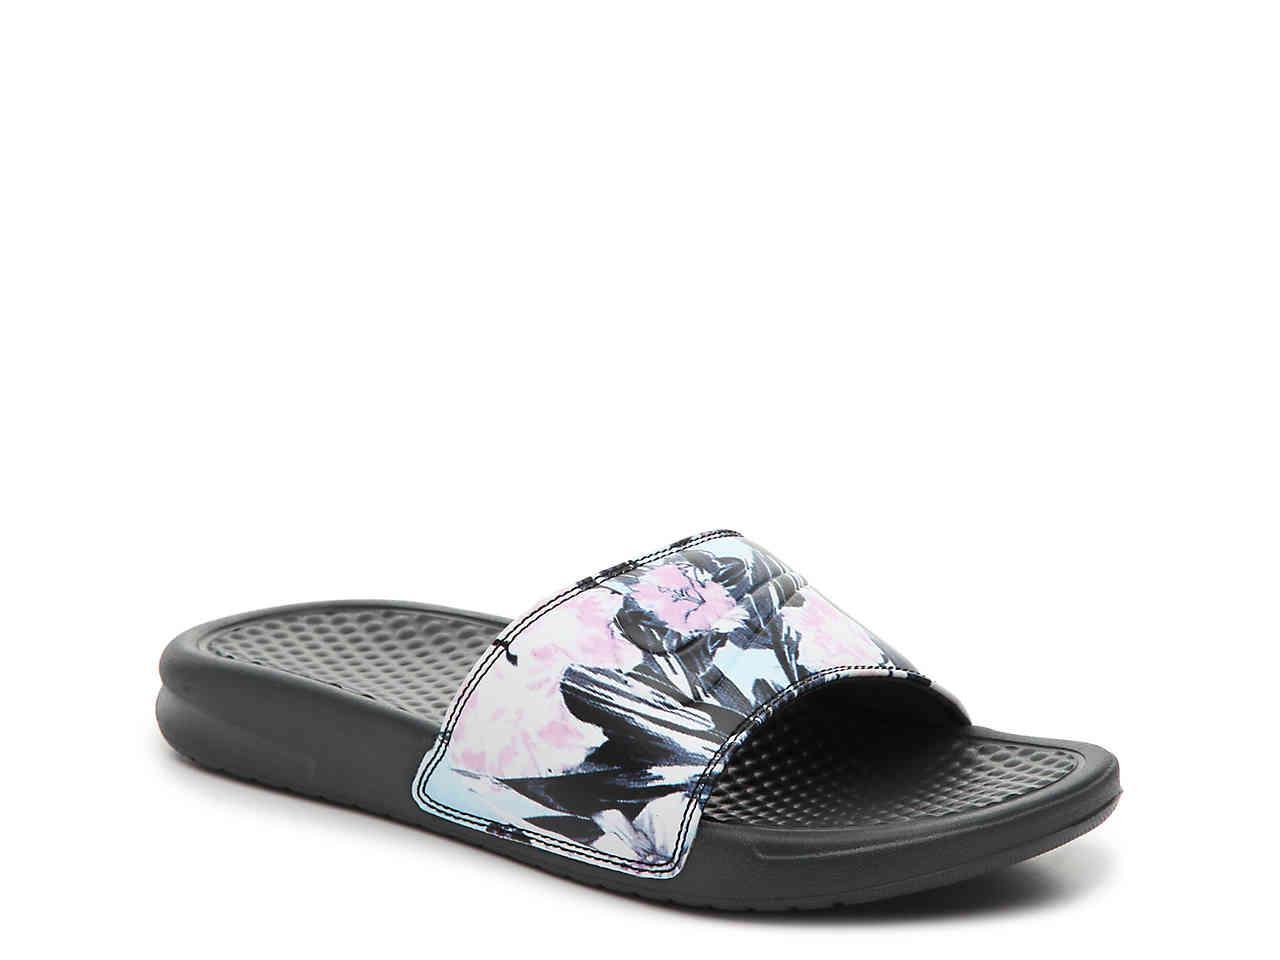 Nike Synthetic Benassi Jdi Slide Shoes